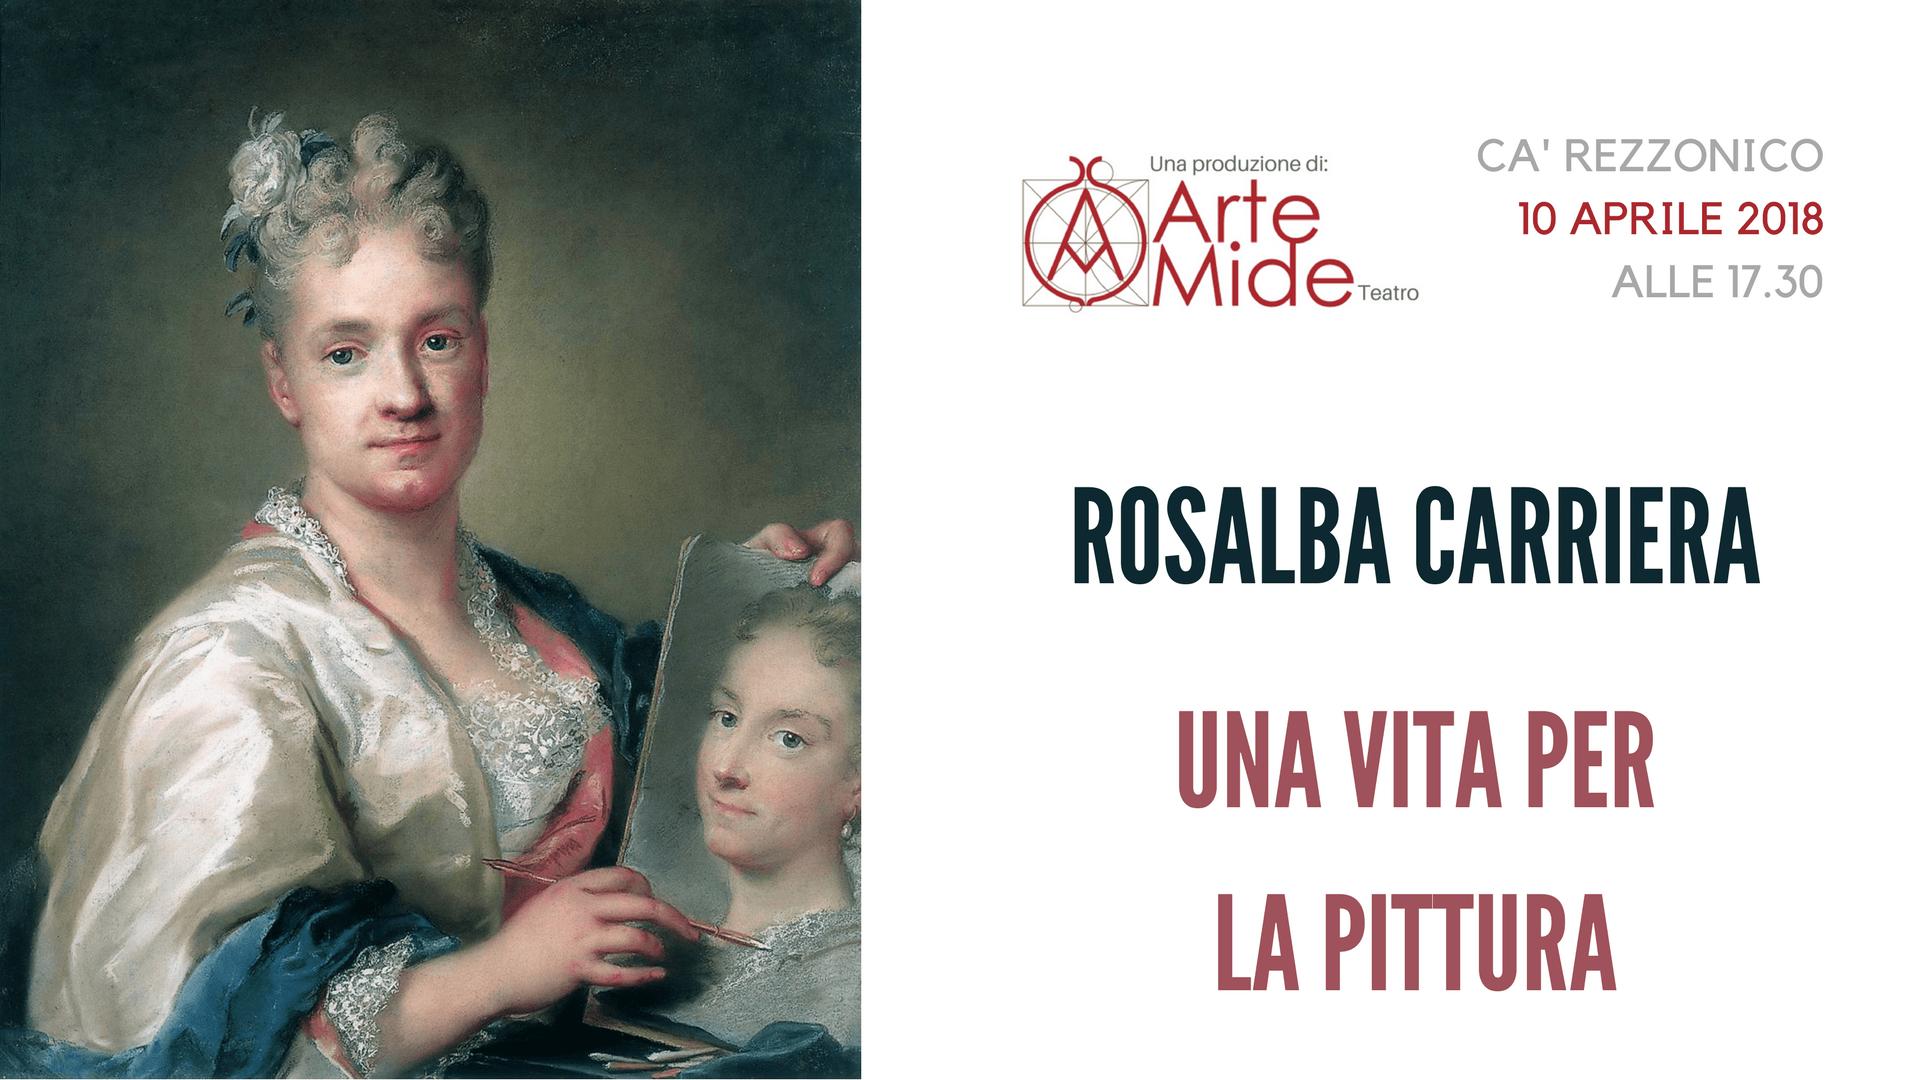 Rosalba Carriera: una vita per la pittura